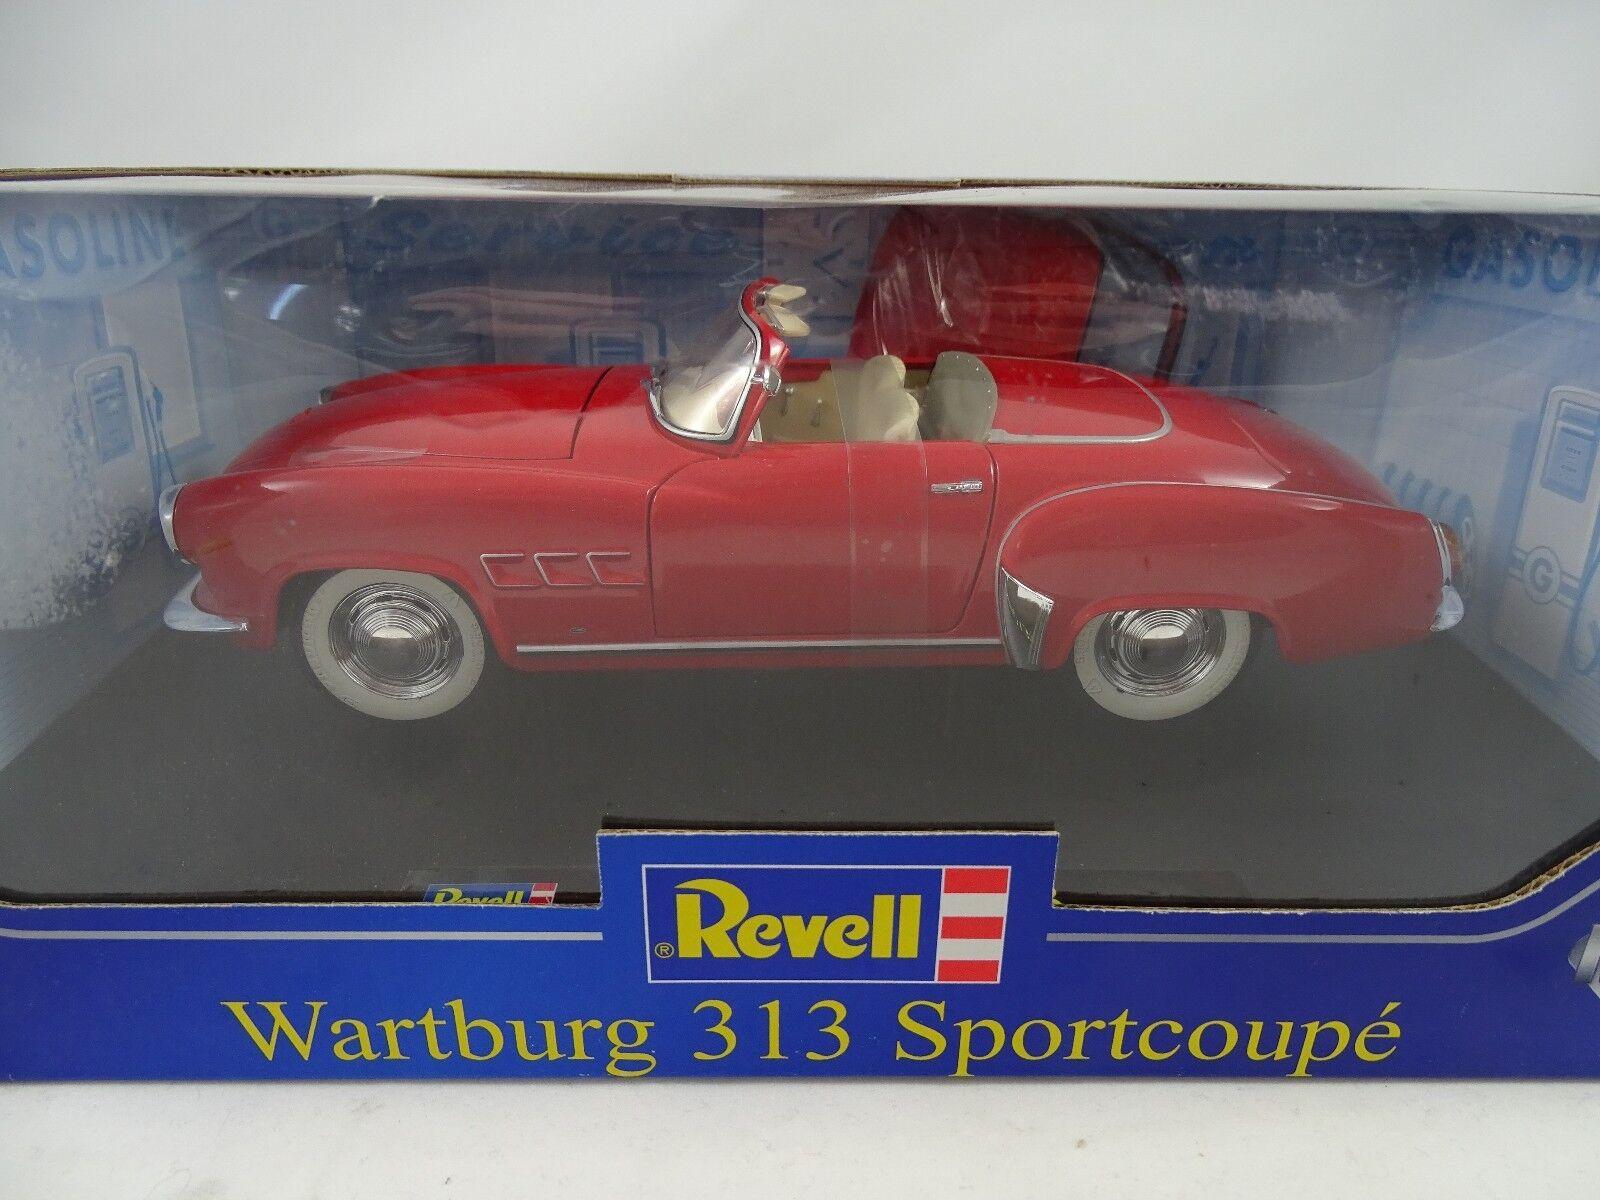 1 18 Revell Wartburg 313 Sport Coupe rosso m. Zus. capota-rareza nuevo en el embalaje original §